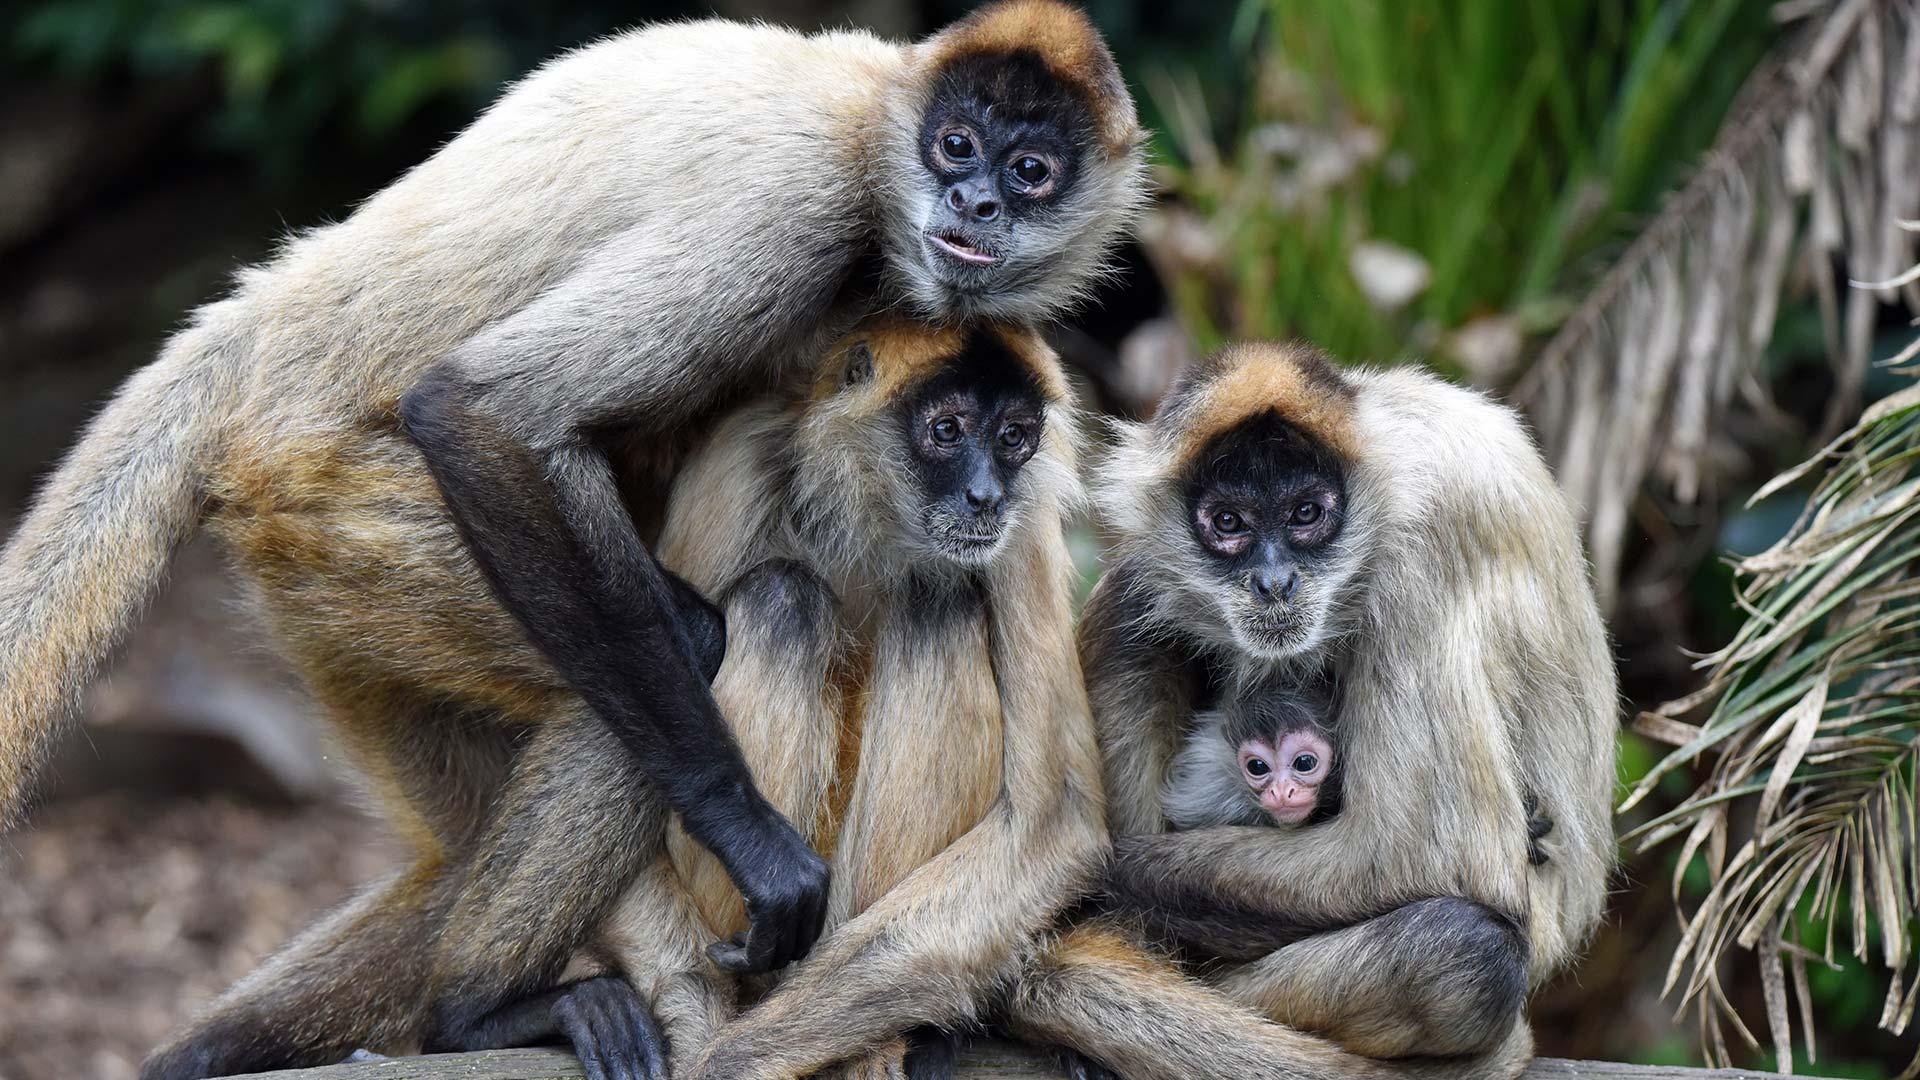 https://rfacdn.nz/zoo/assets/media/spider-monkey-baby-gallery.jpg